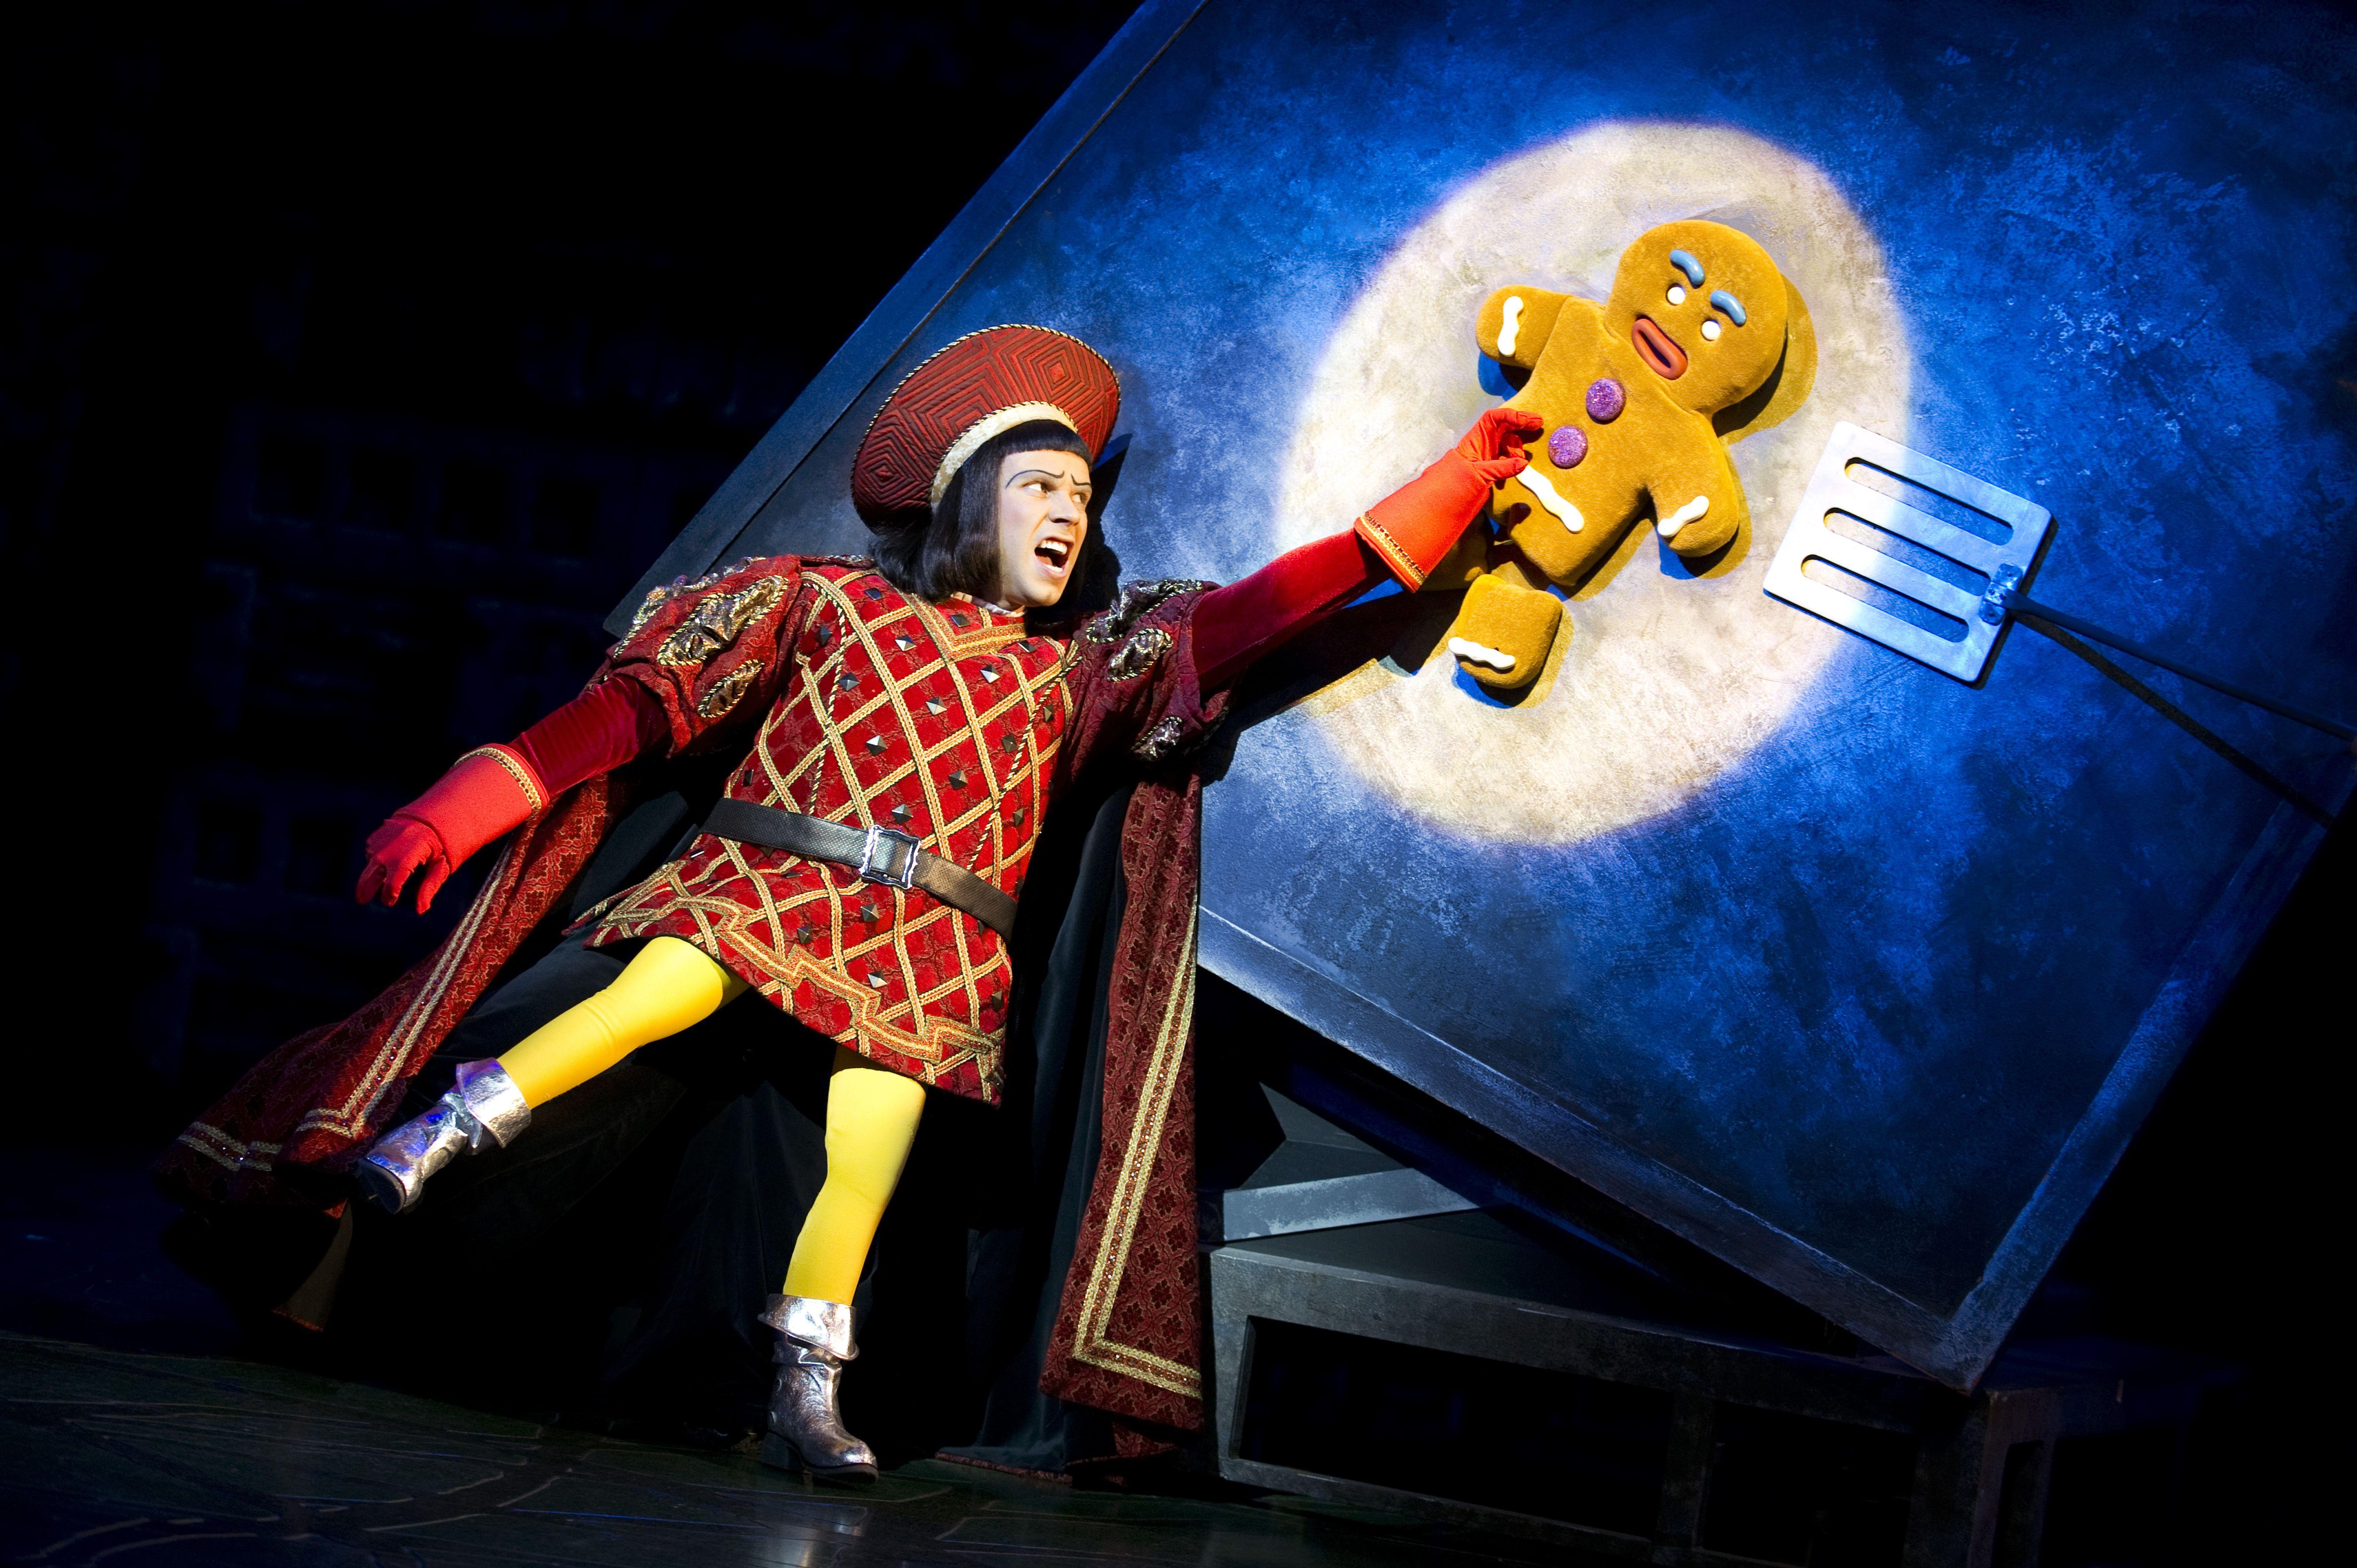 Lord Farquaad witht he Gingerbread man shrek musical